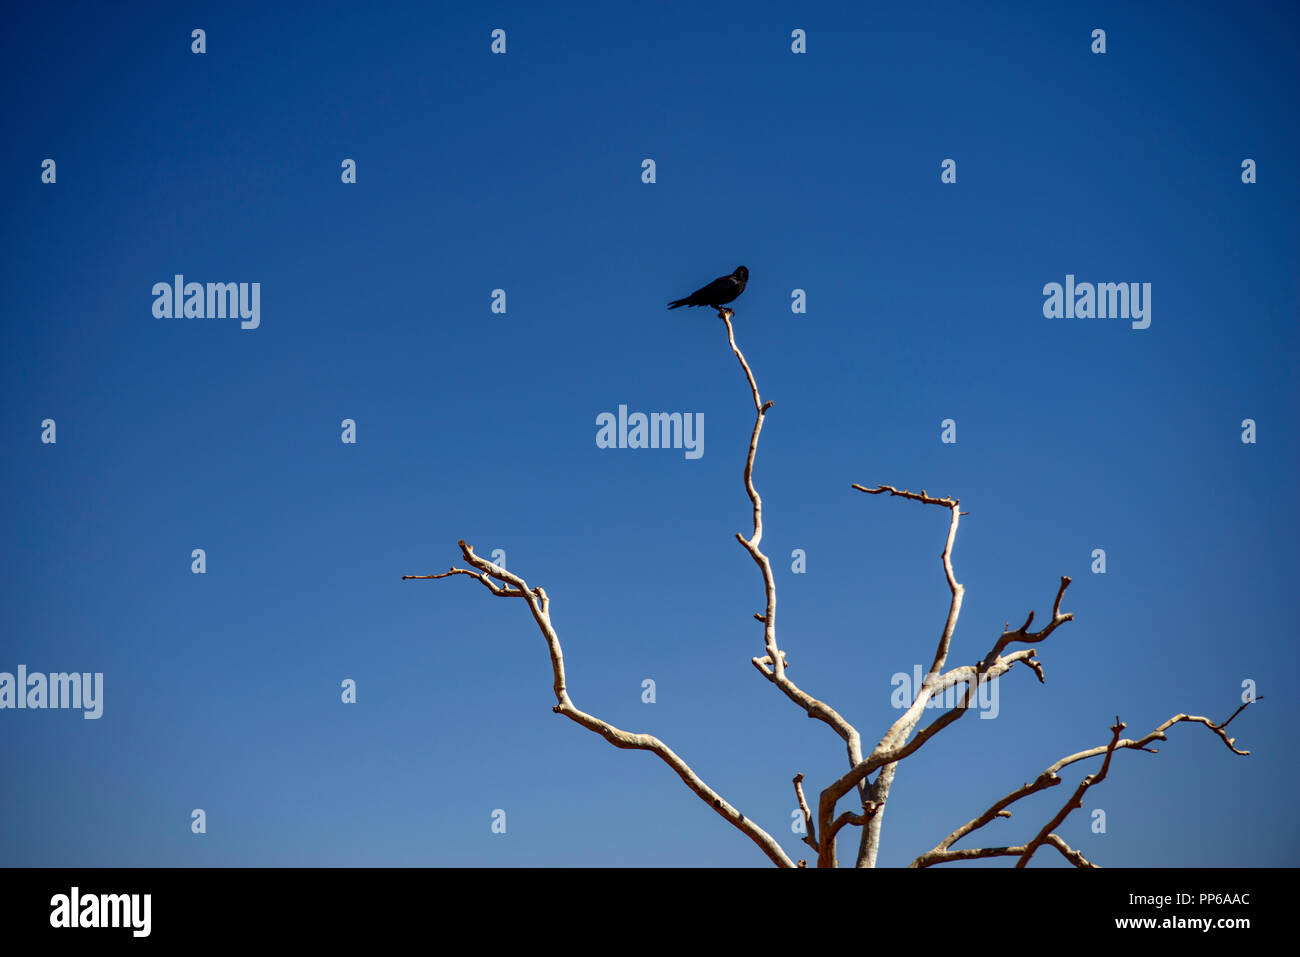 Black crow, raven, .Corvus coronoides.  sitting on a dead tree, Western Australia - Stock Image